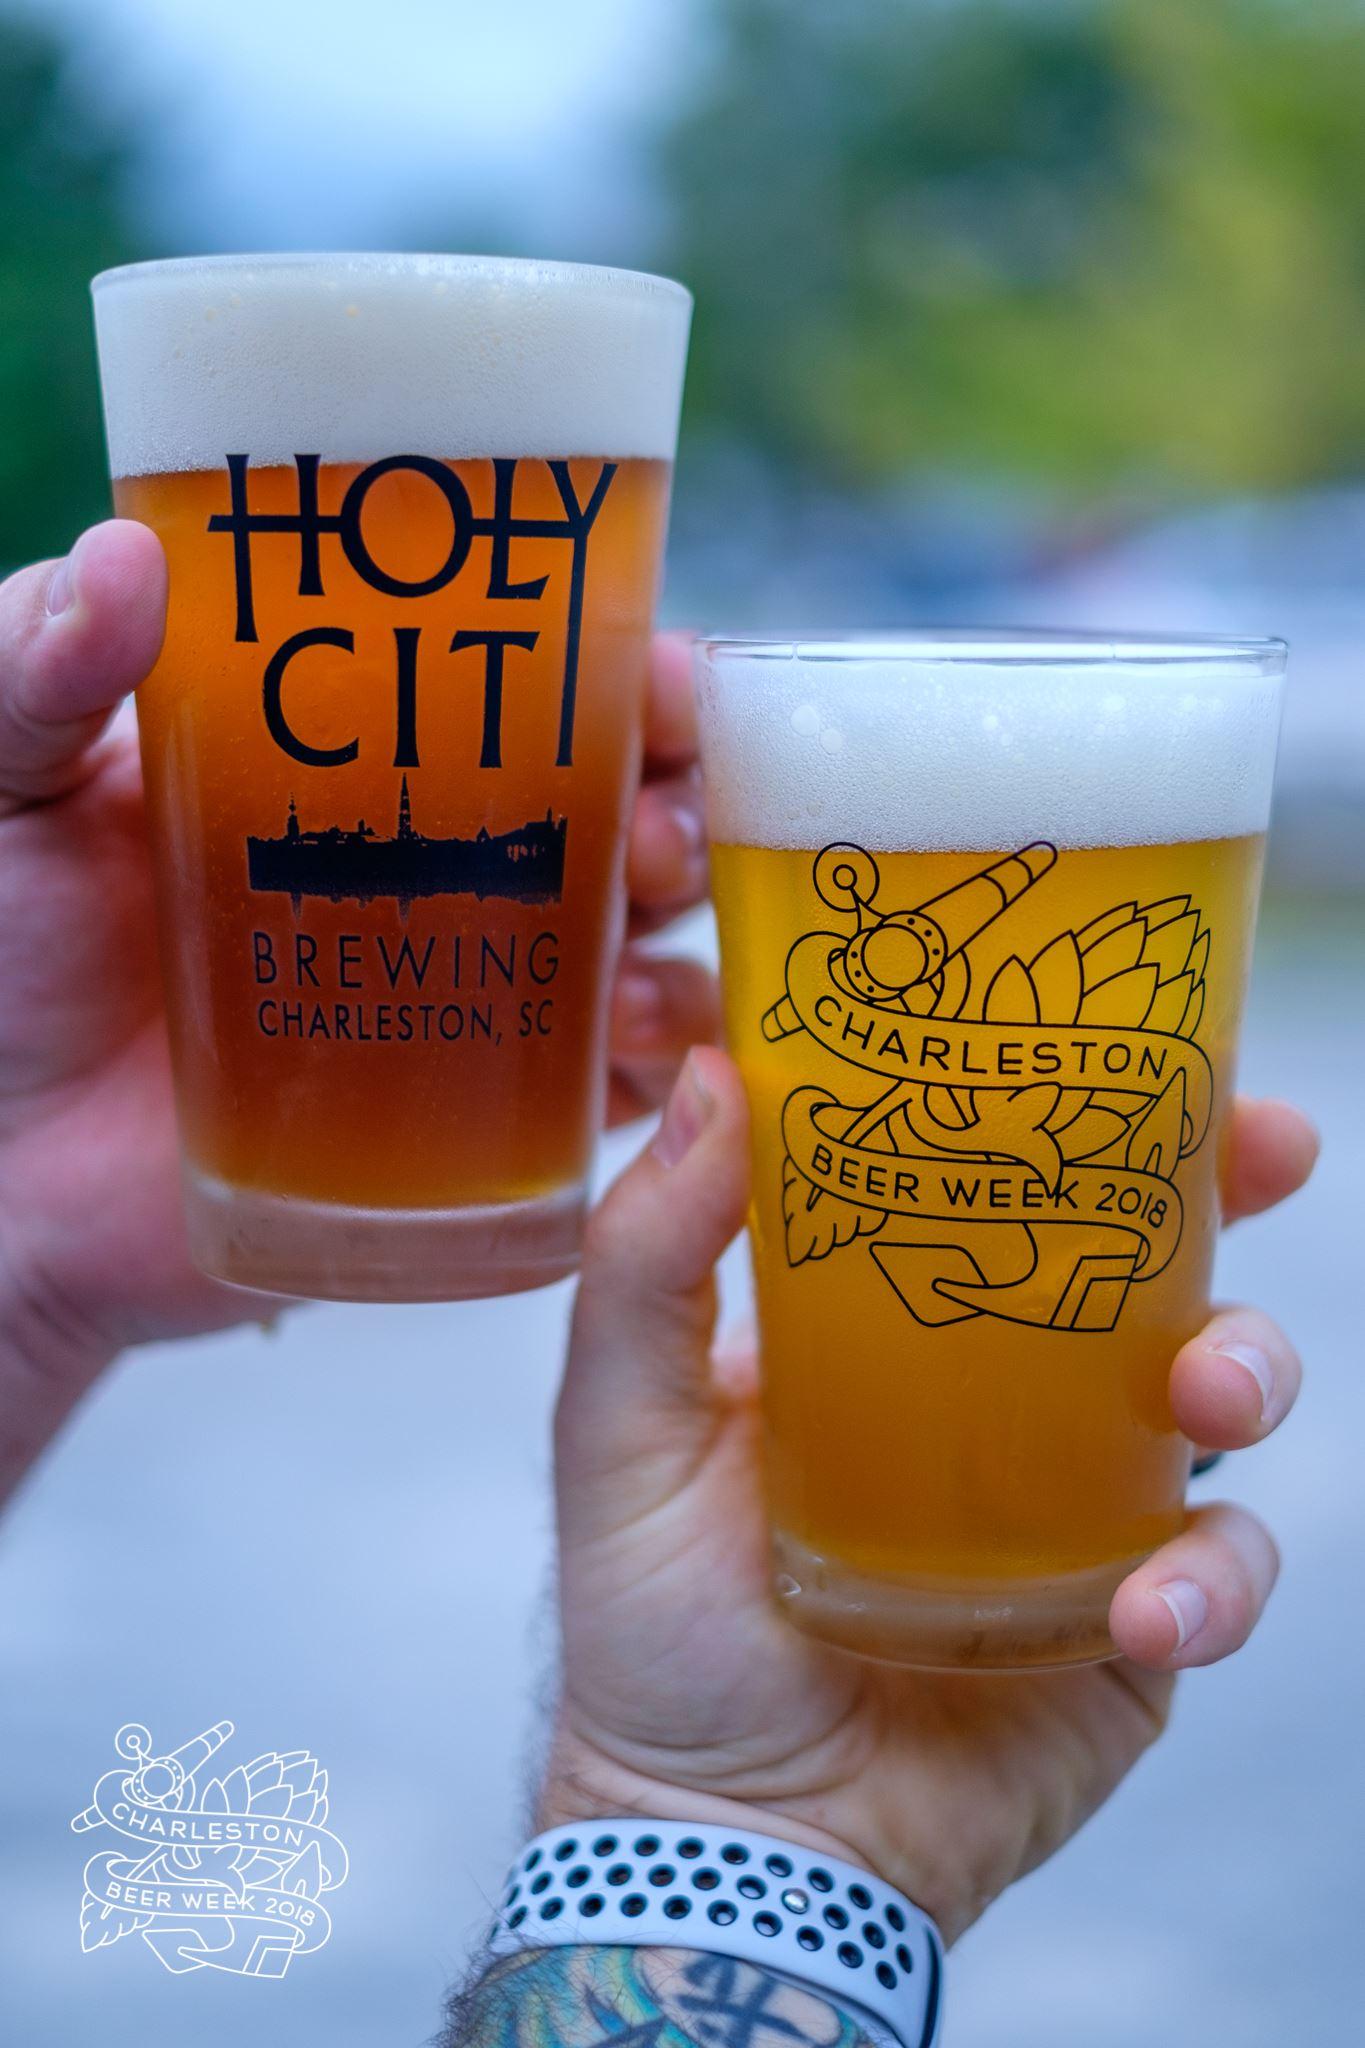 Holy City Brewing and Charleston Beer Week Pint Glasses